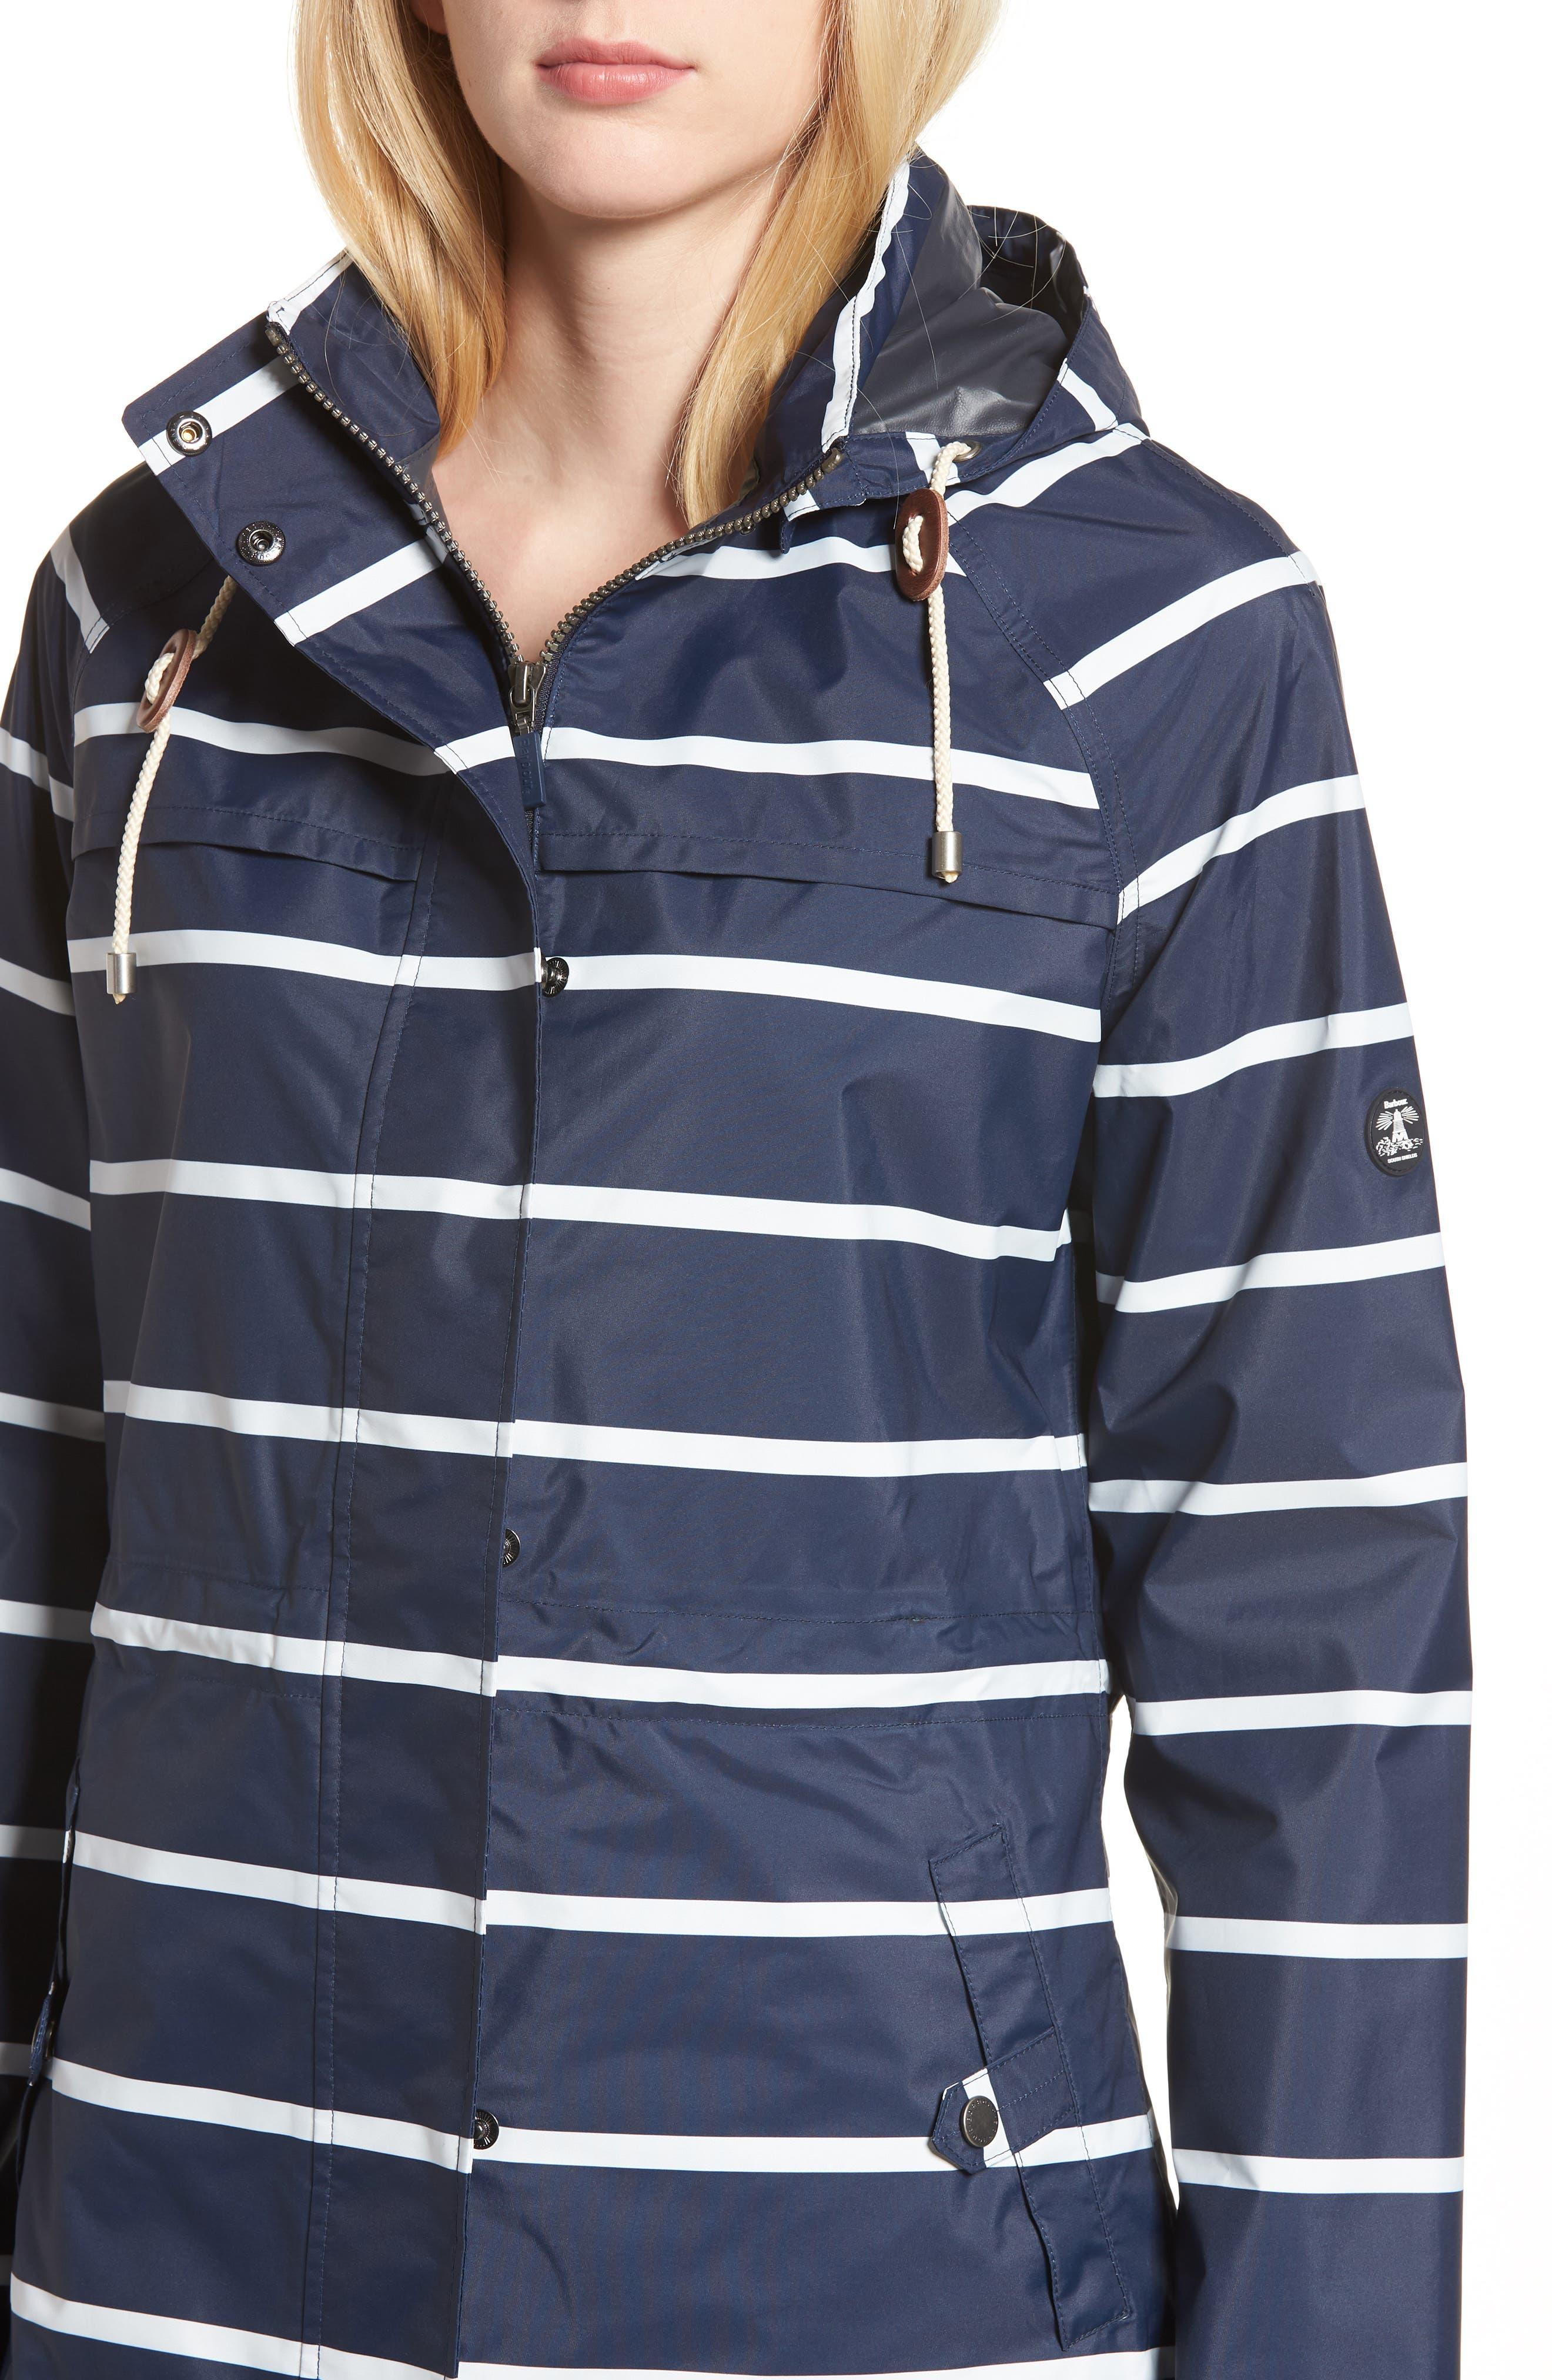 Holliwell Stripe Hooded Jacket,                             Alternate thumbnail 4, color,                             410